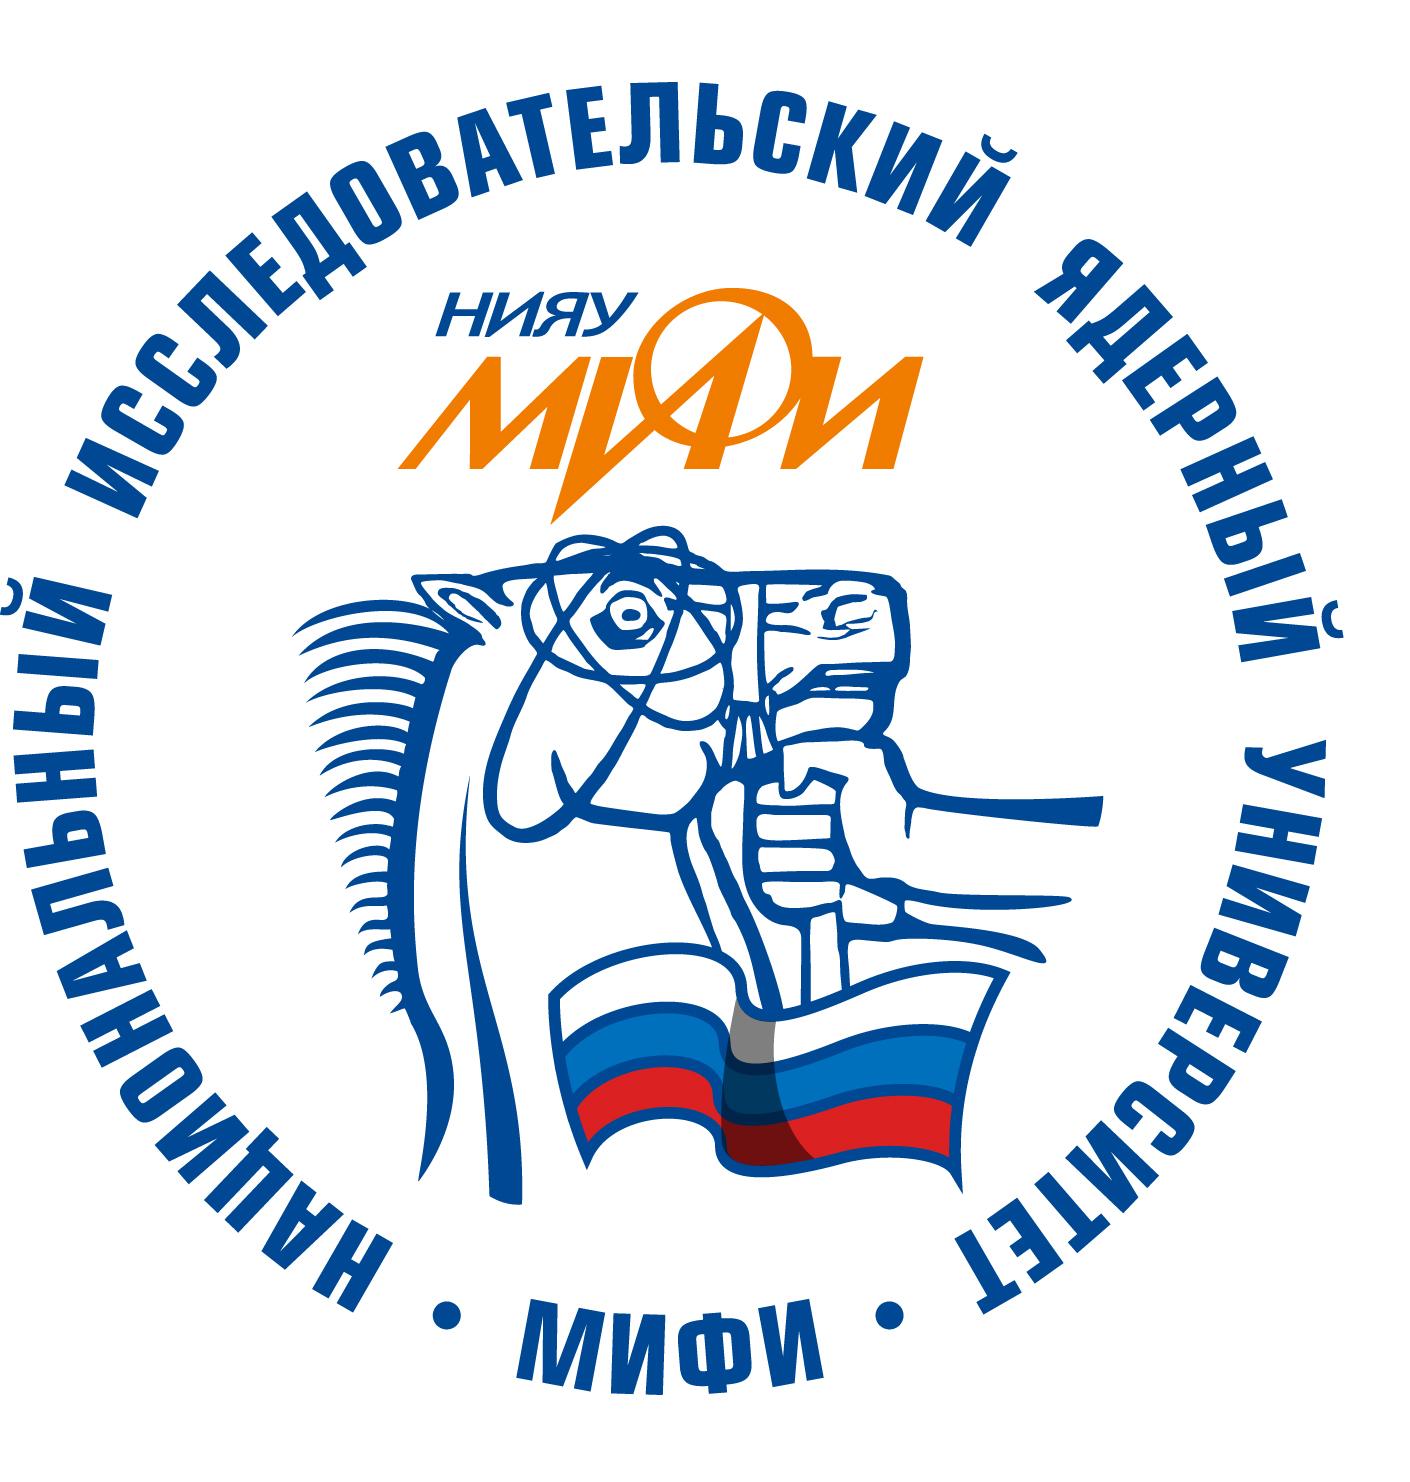 logo_mephi2.jpg